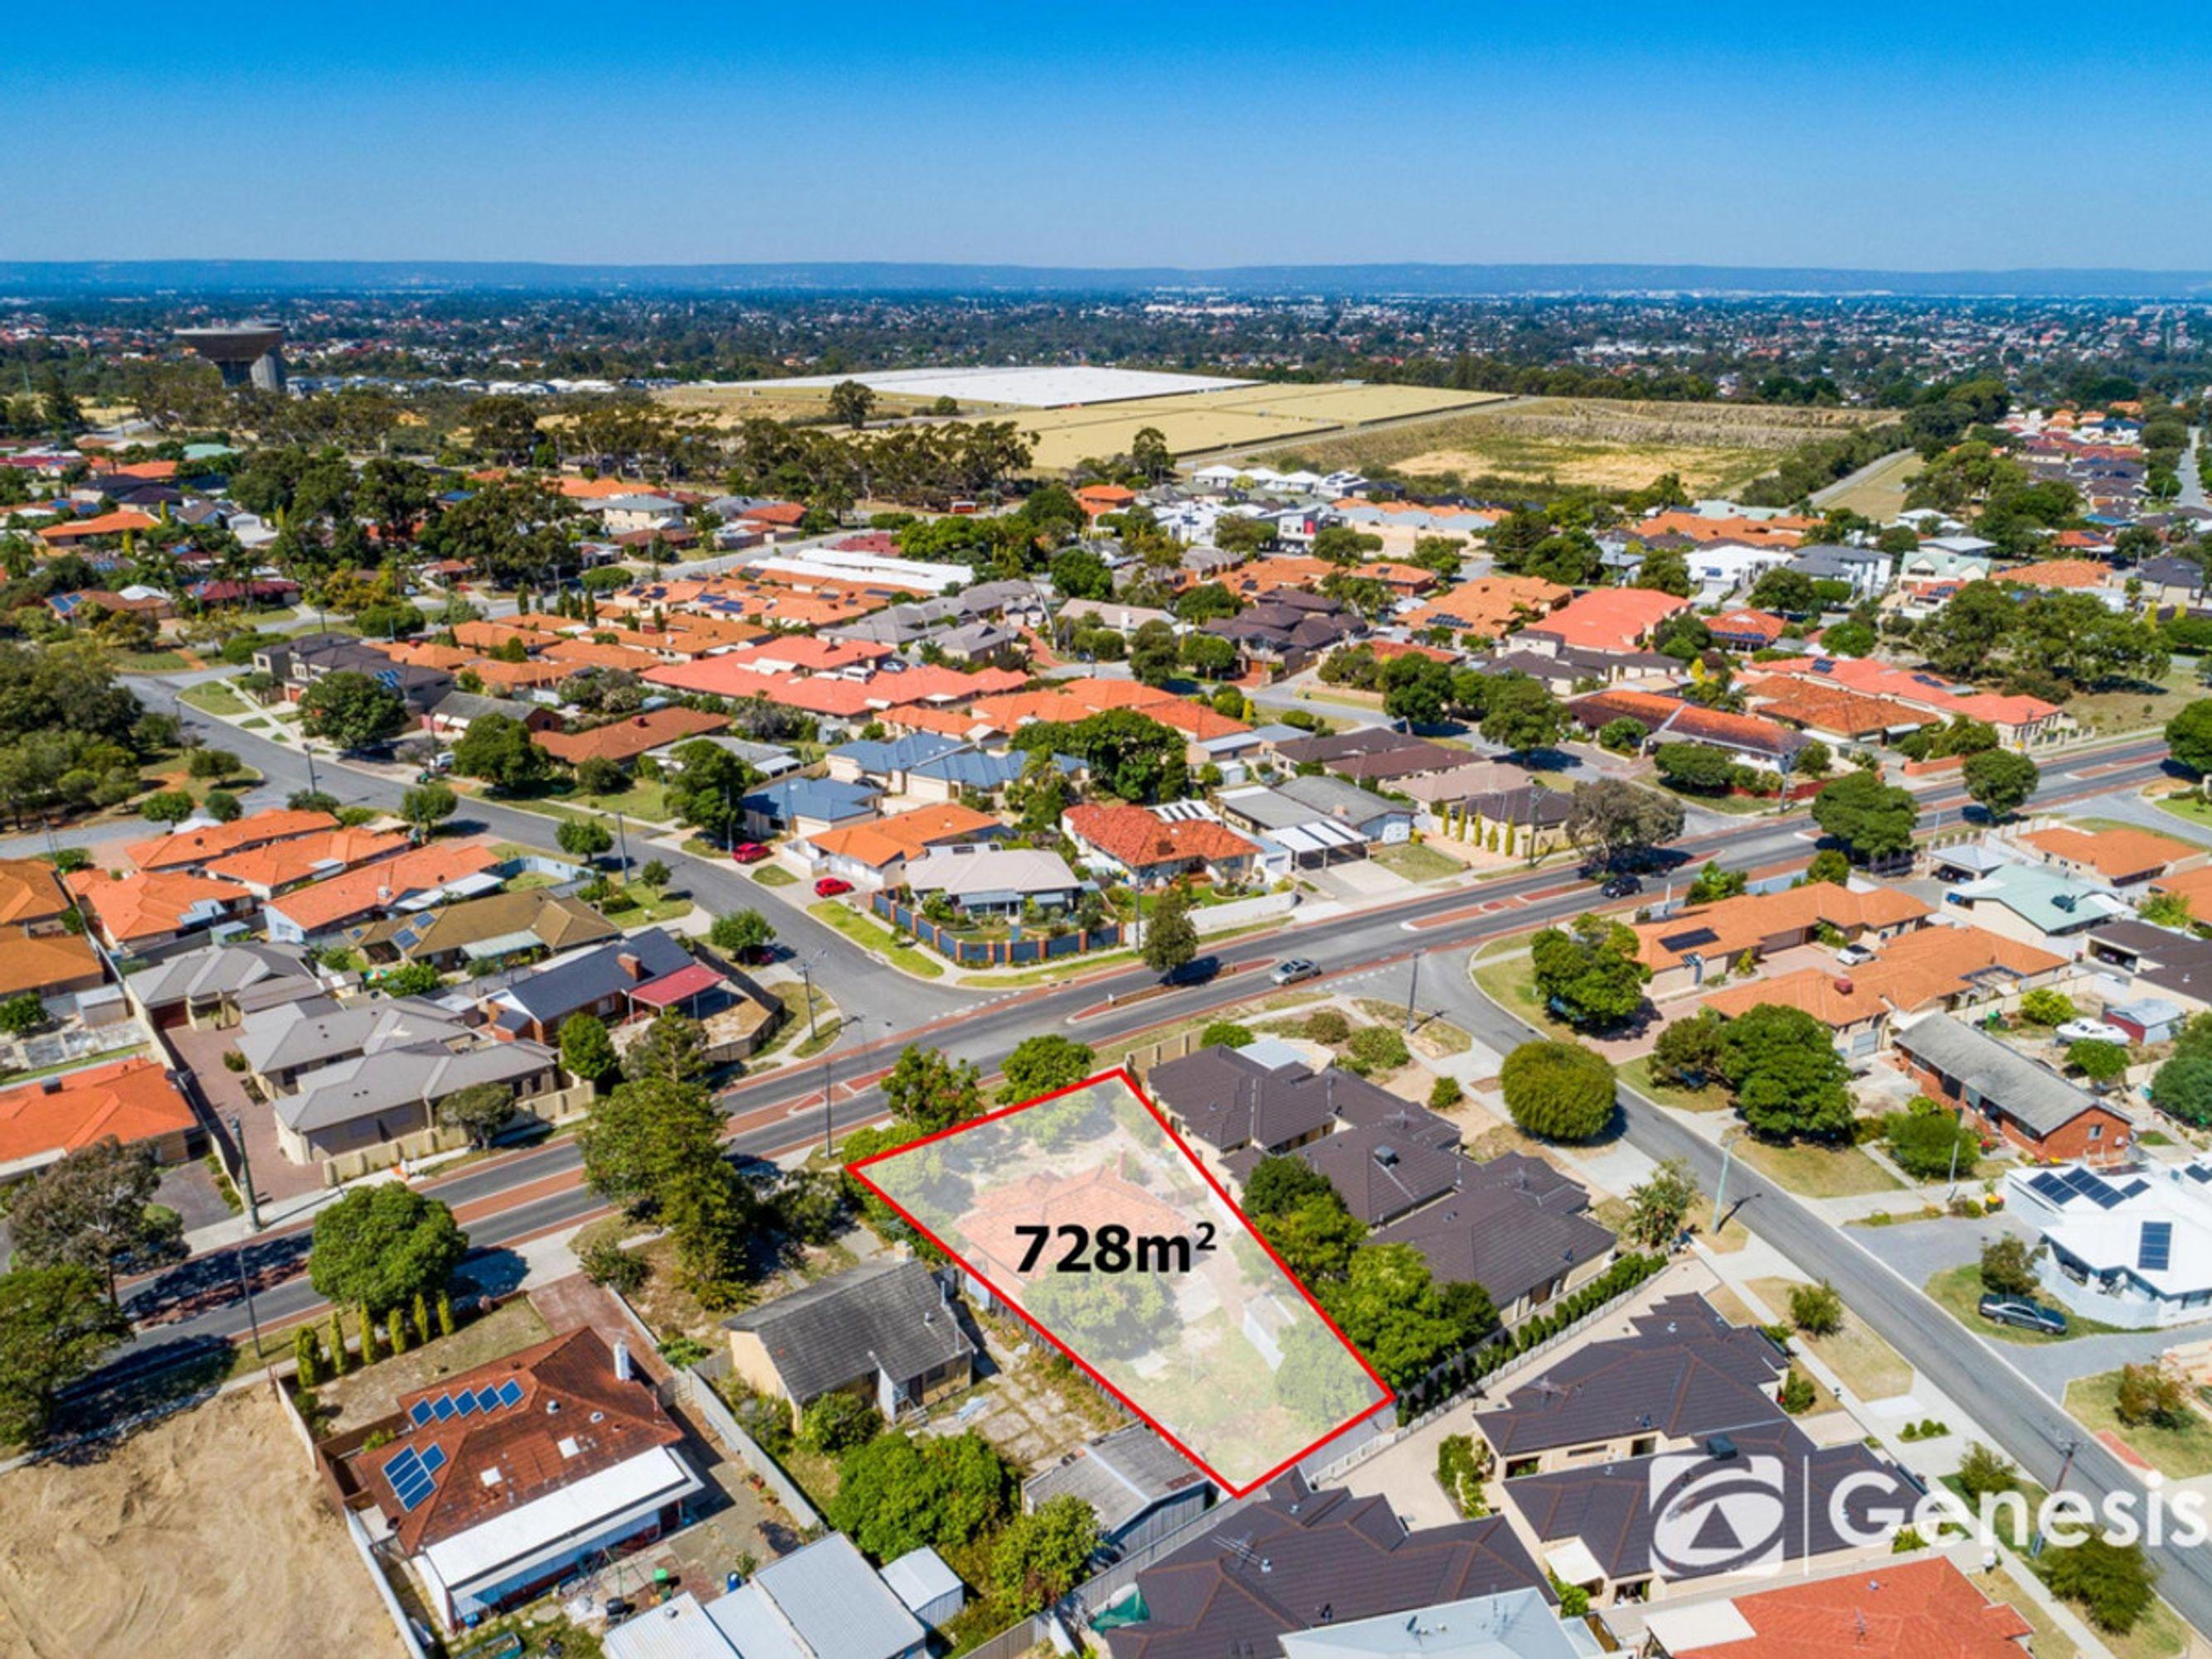 305 Flinders Street, Nollamara, WA 6061